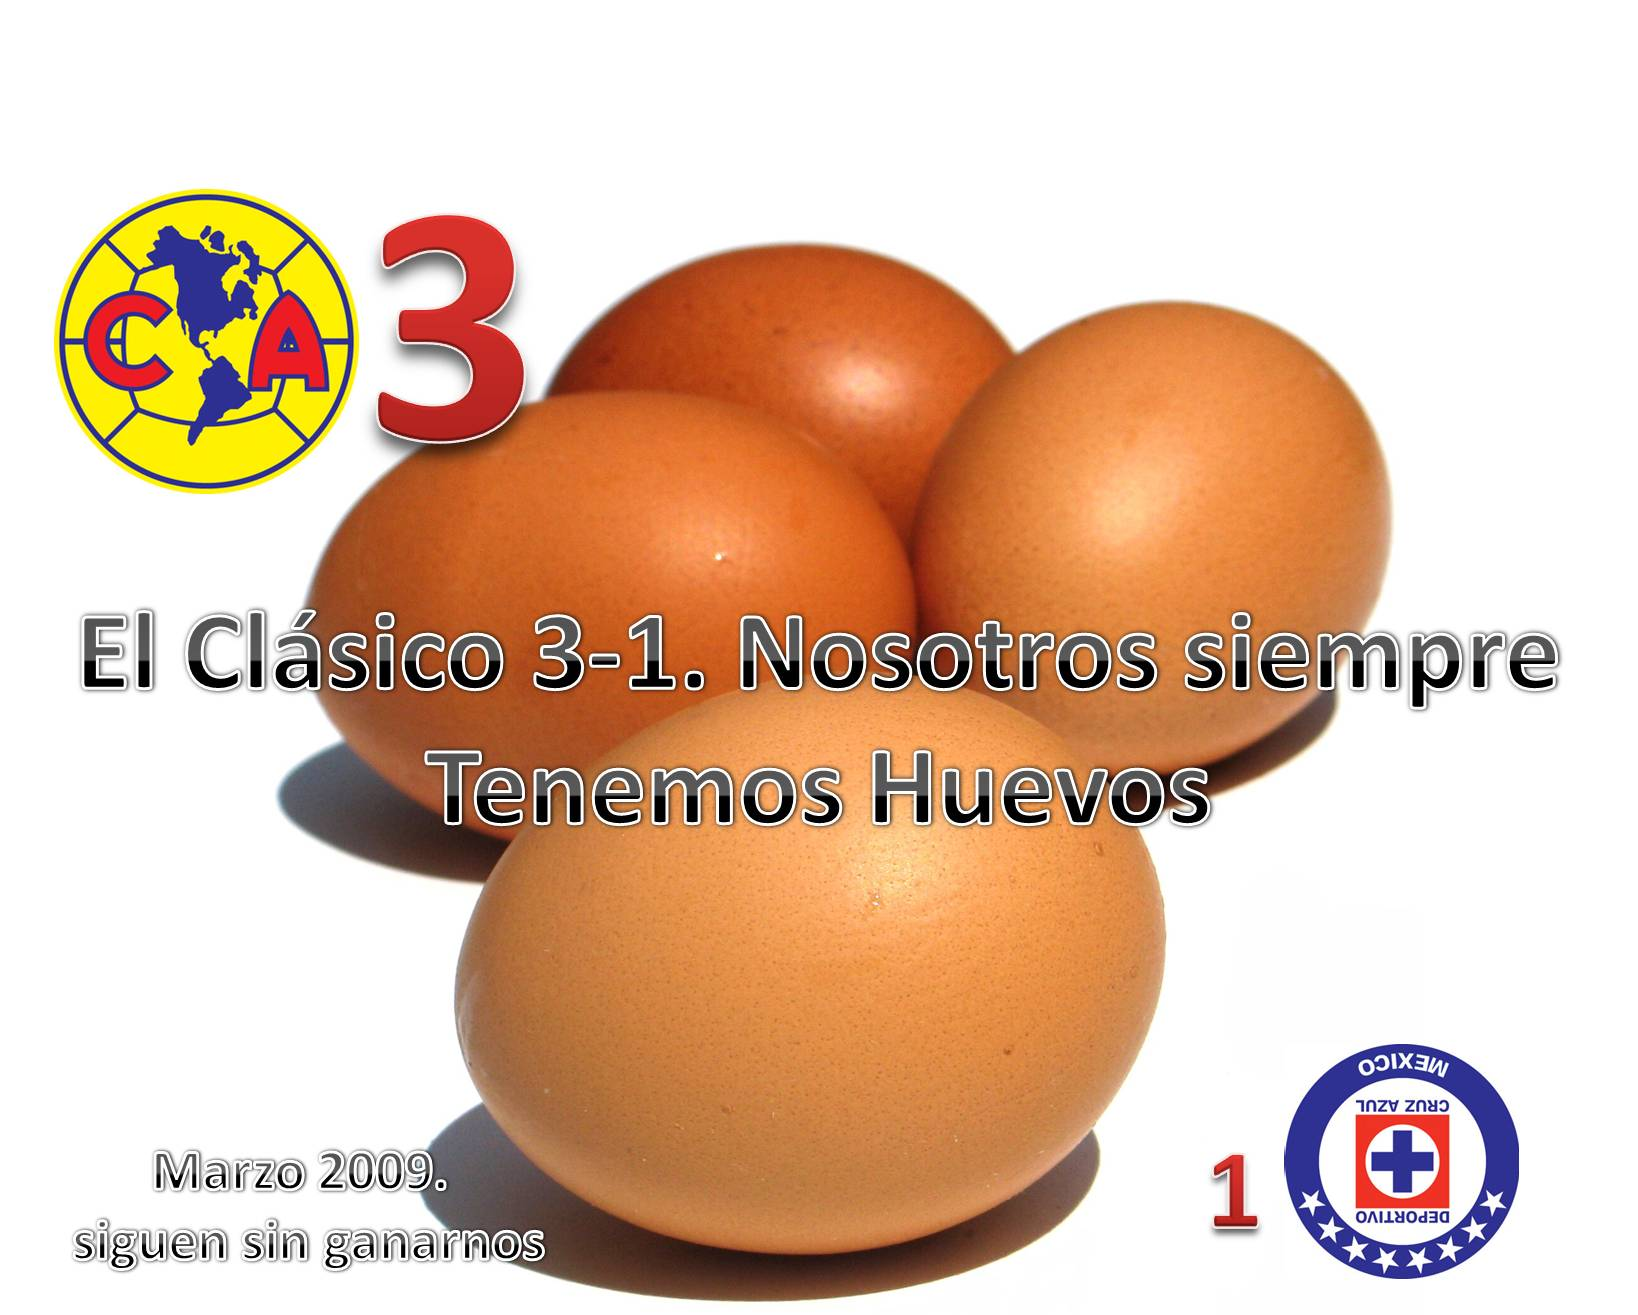 Monterrey vs Guadalajara Jornada 12 en Minuto a Minuto